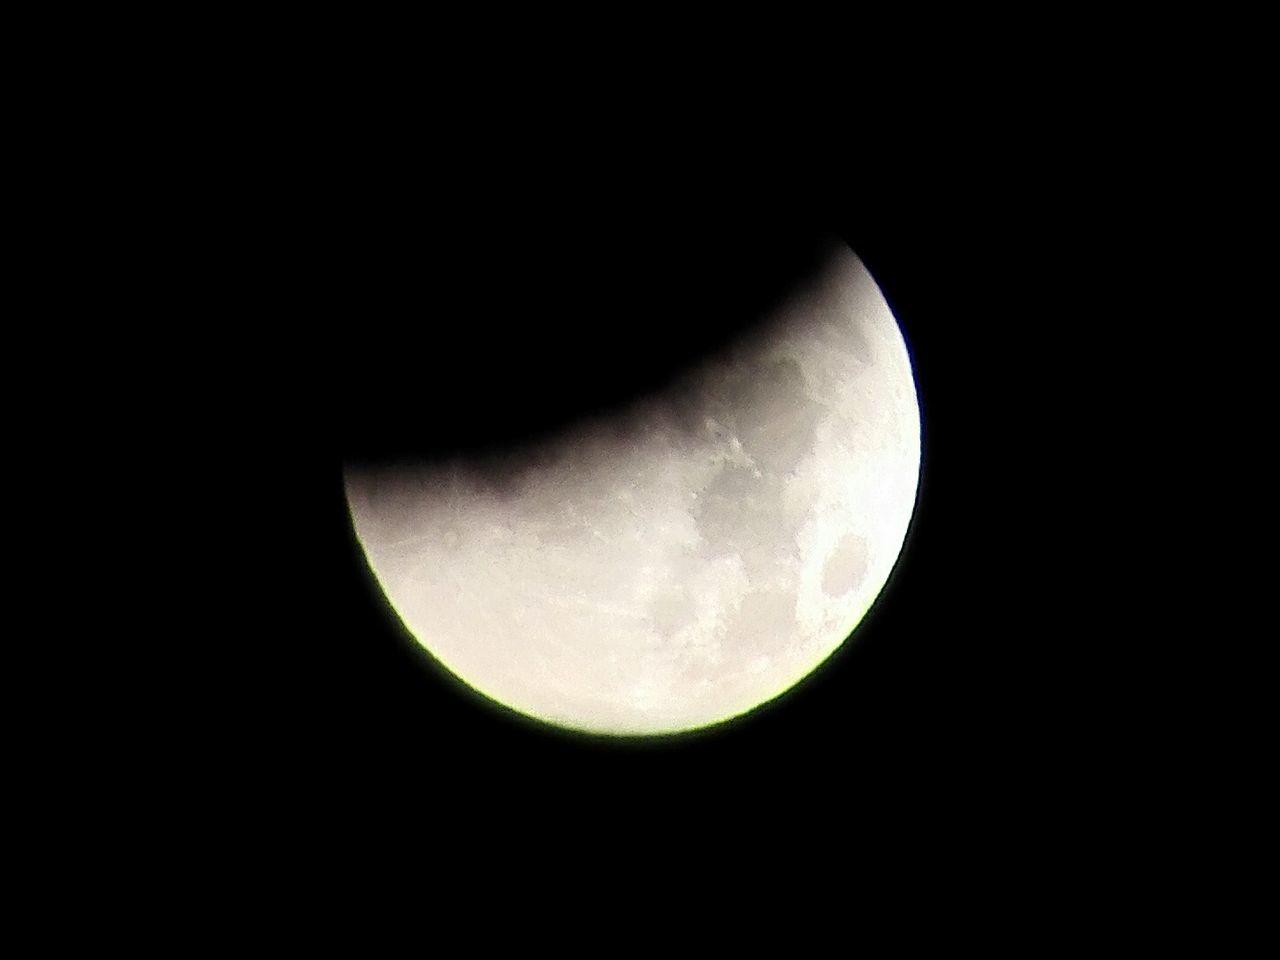 Lunar Eclipse Eclipse2015 Moon Earths Shadow